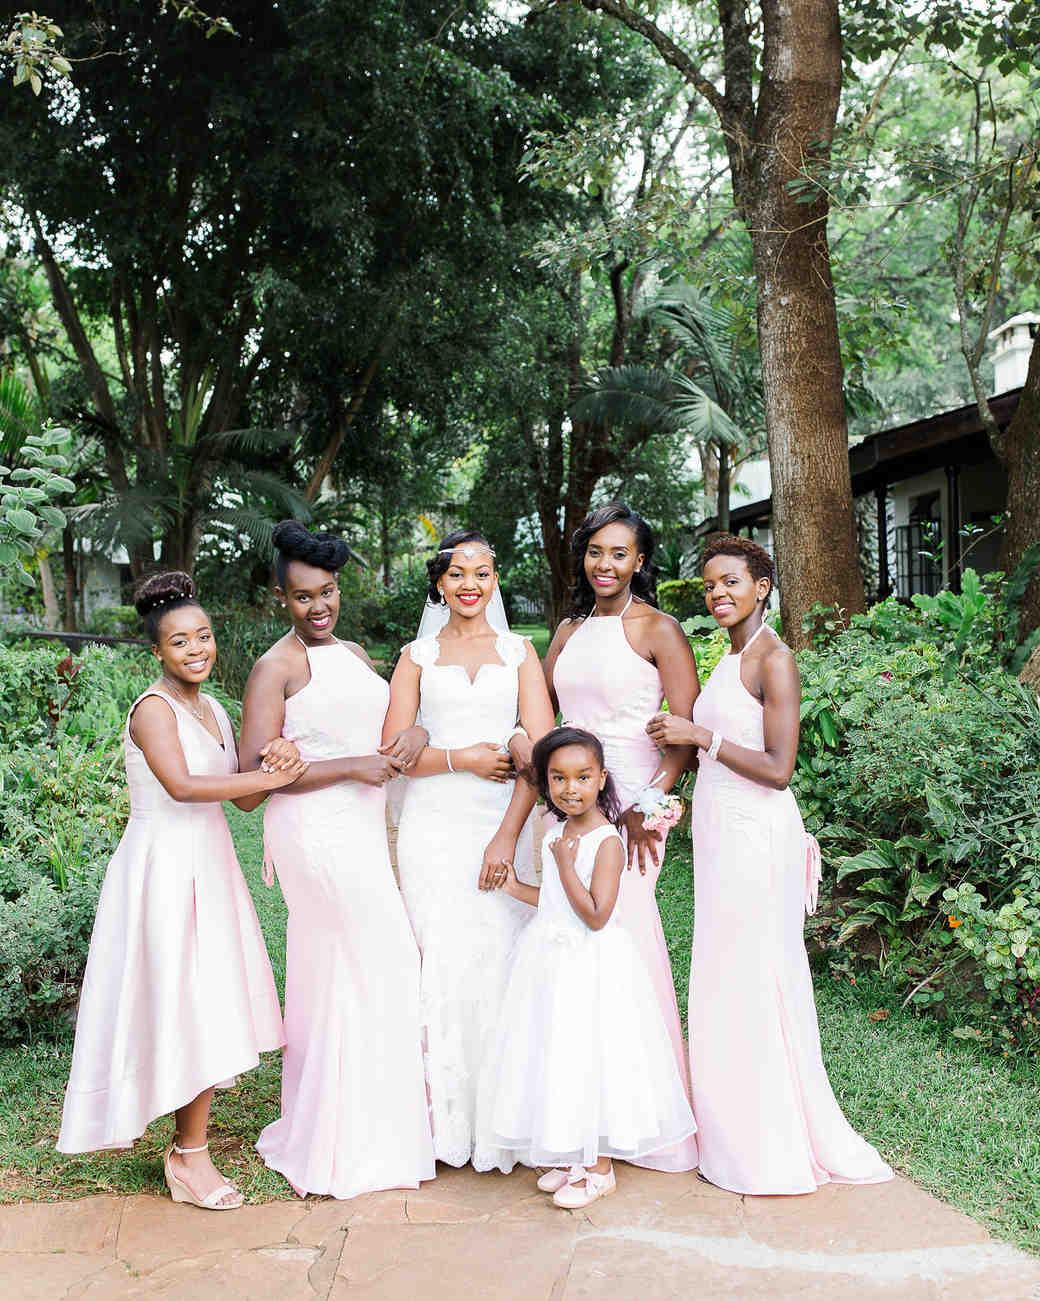 best dressed bridesmaids kibogo photography